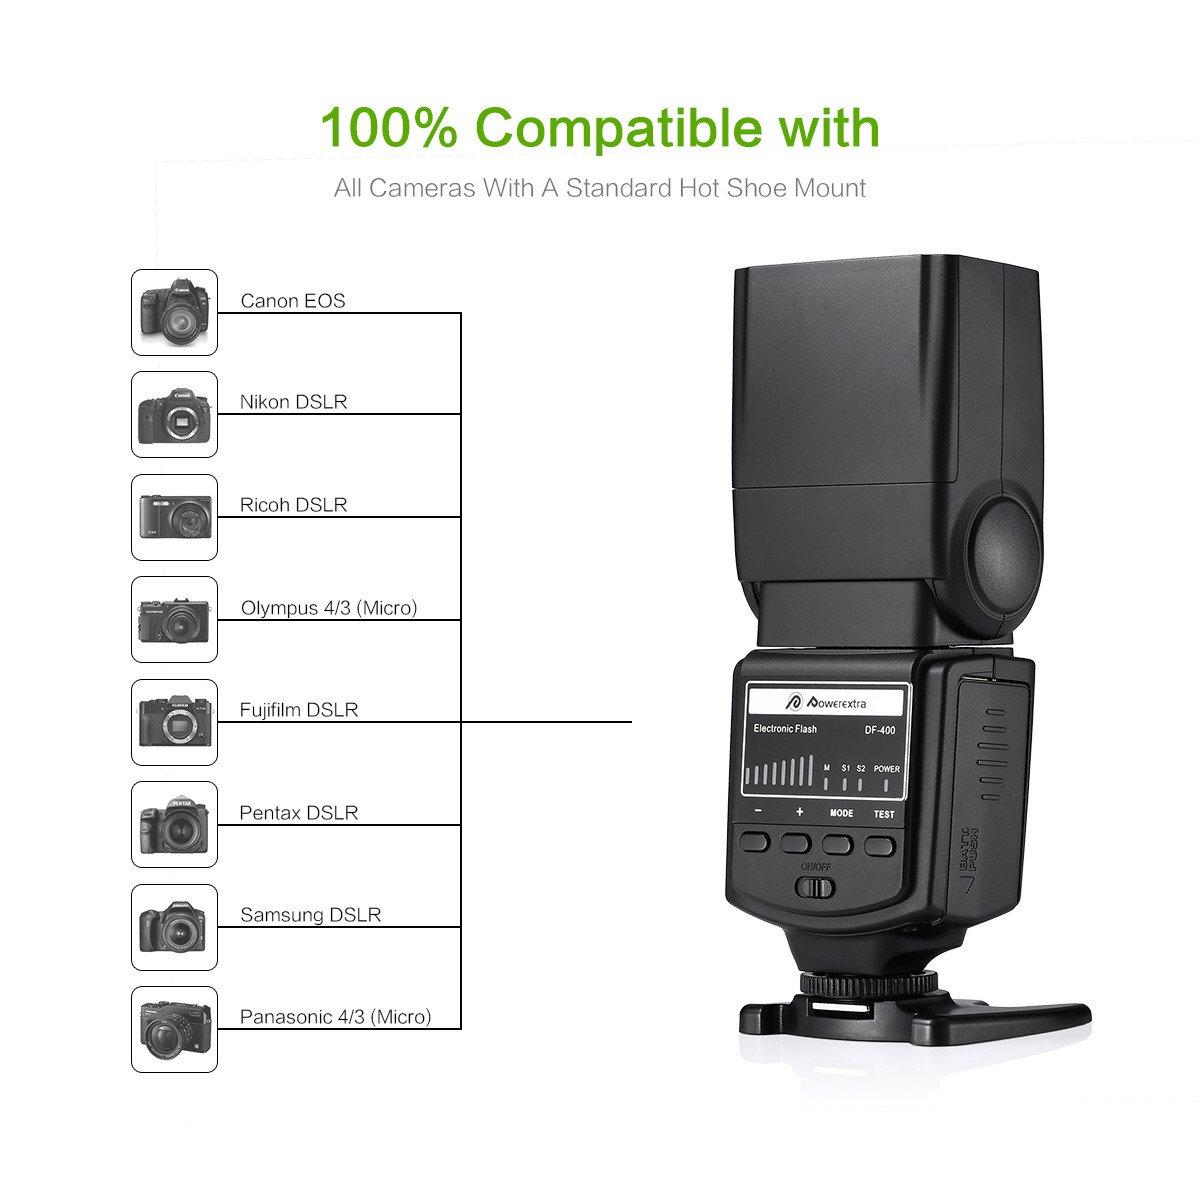 Powerextra Professional DF-400 Speedlite Camera Flash for Canon ...